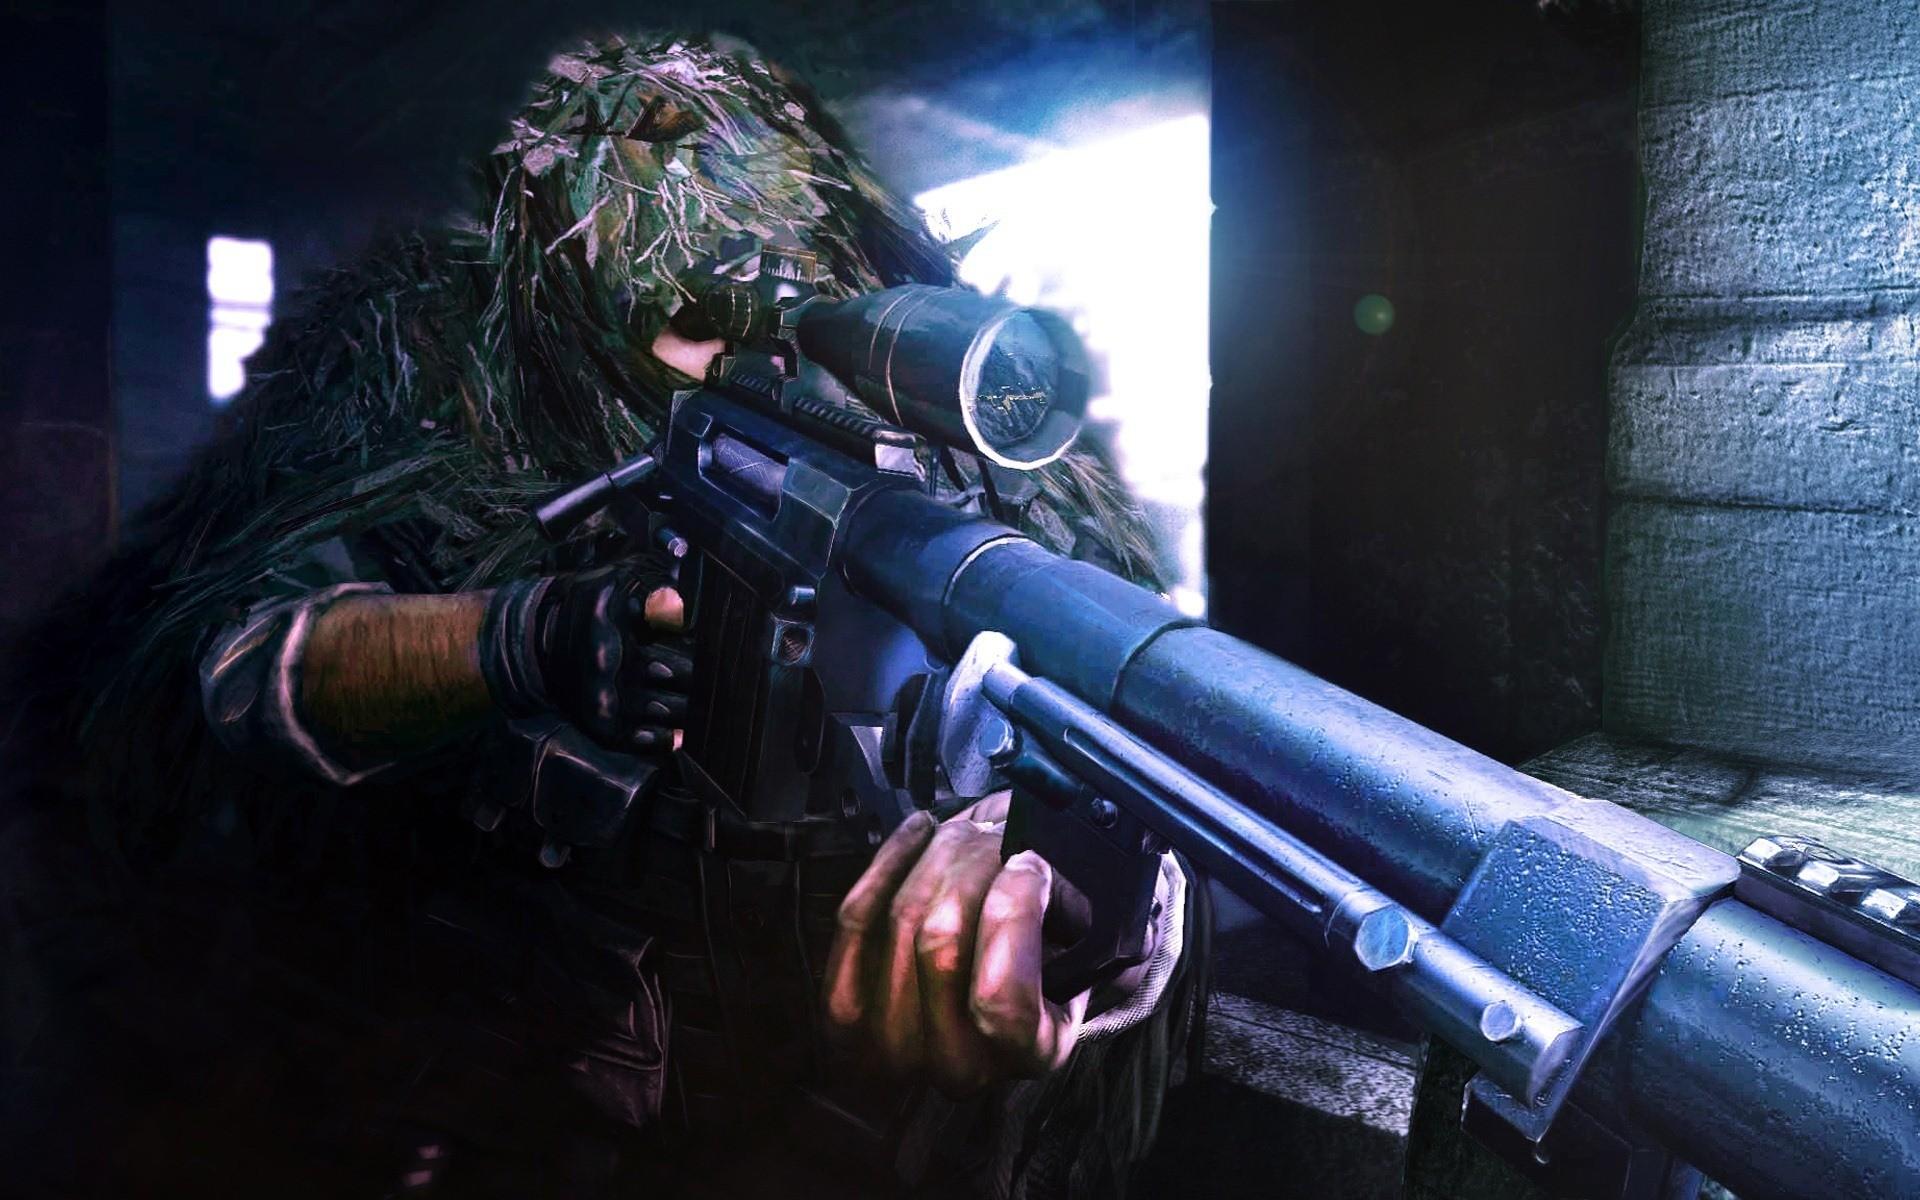 Sniper-Ghost-Warrior-2-Wallpapers-Game-Hd-Wallpaper.jpg (1920×1200) | Poses  | Pinterest | Videogames